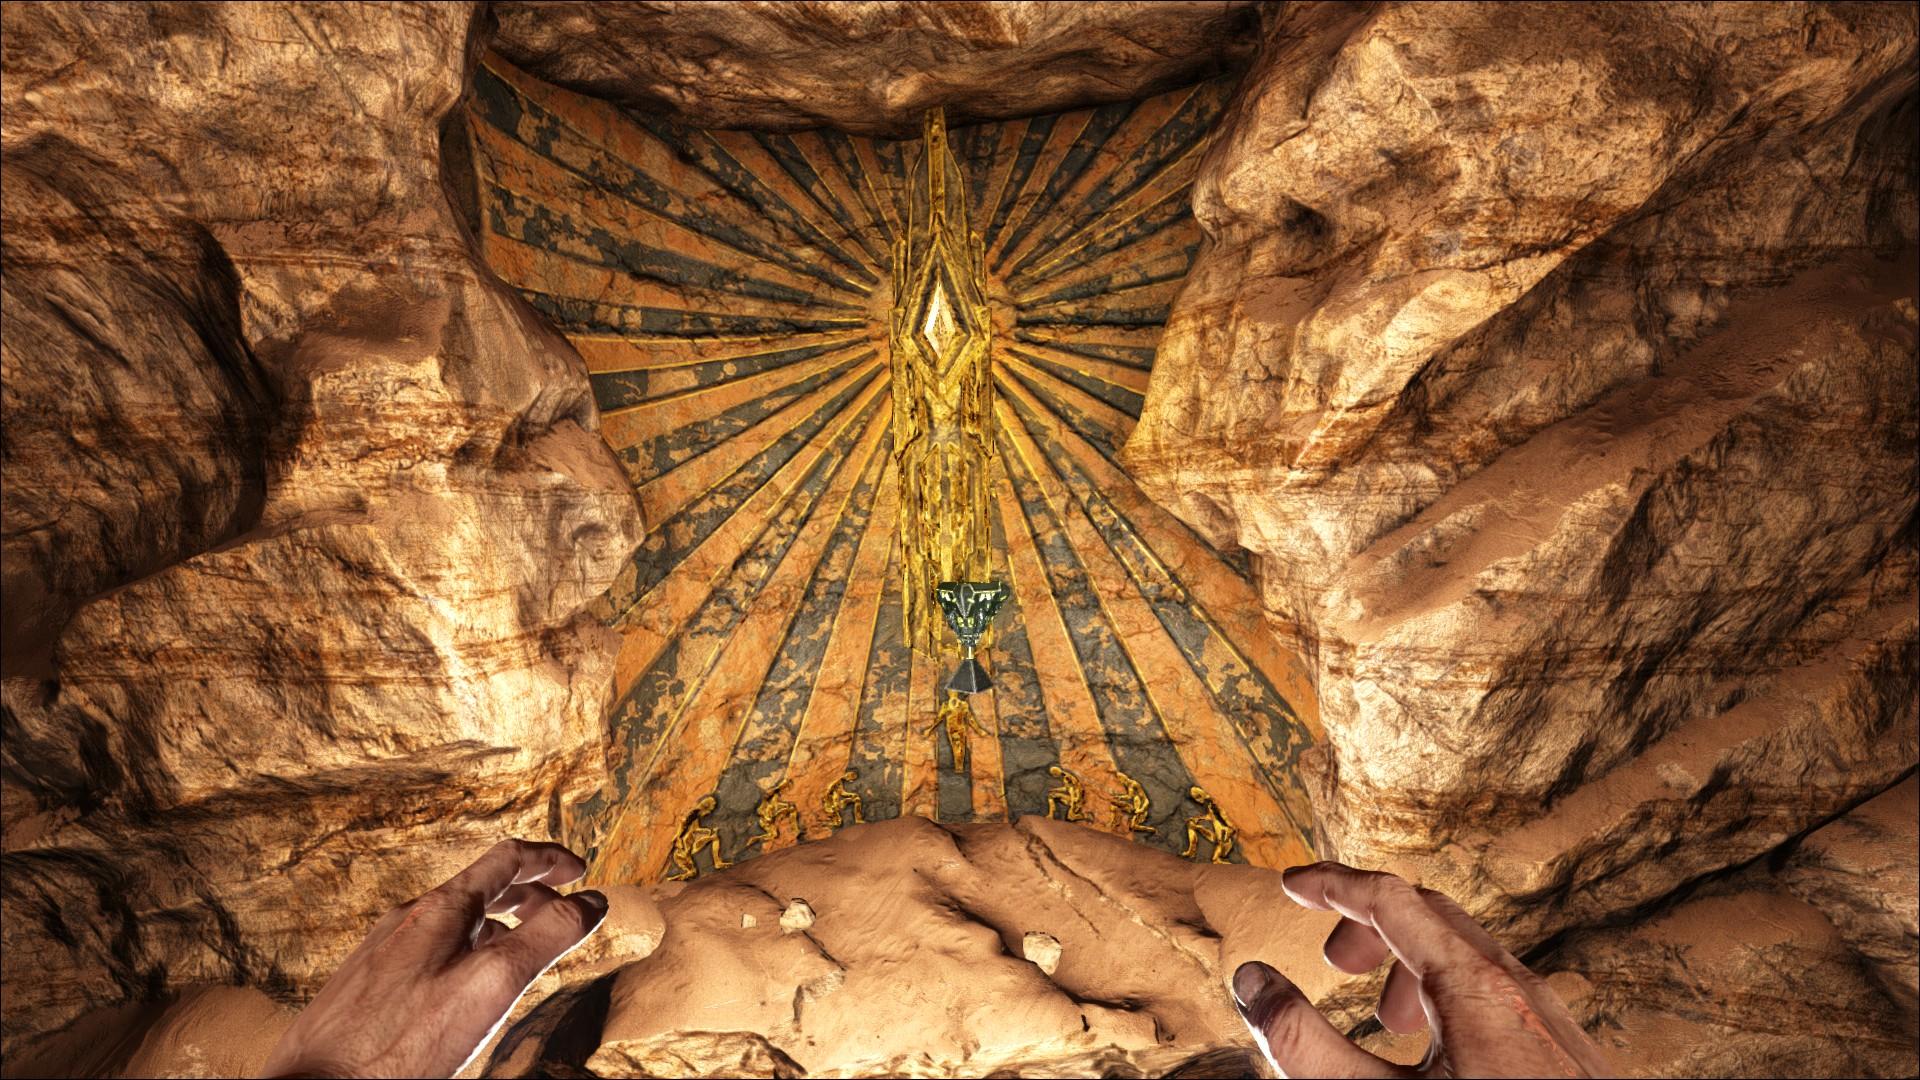 Die Höhlen in ARK: Scorched Earth - Tutorials / HowTo - Ark Survival Evolved Forum ...